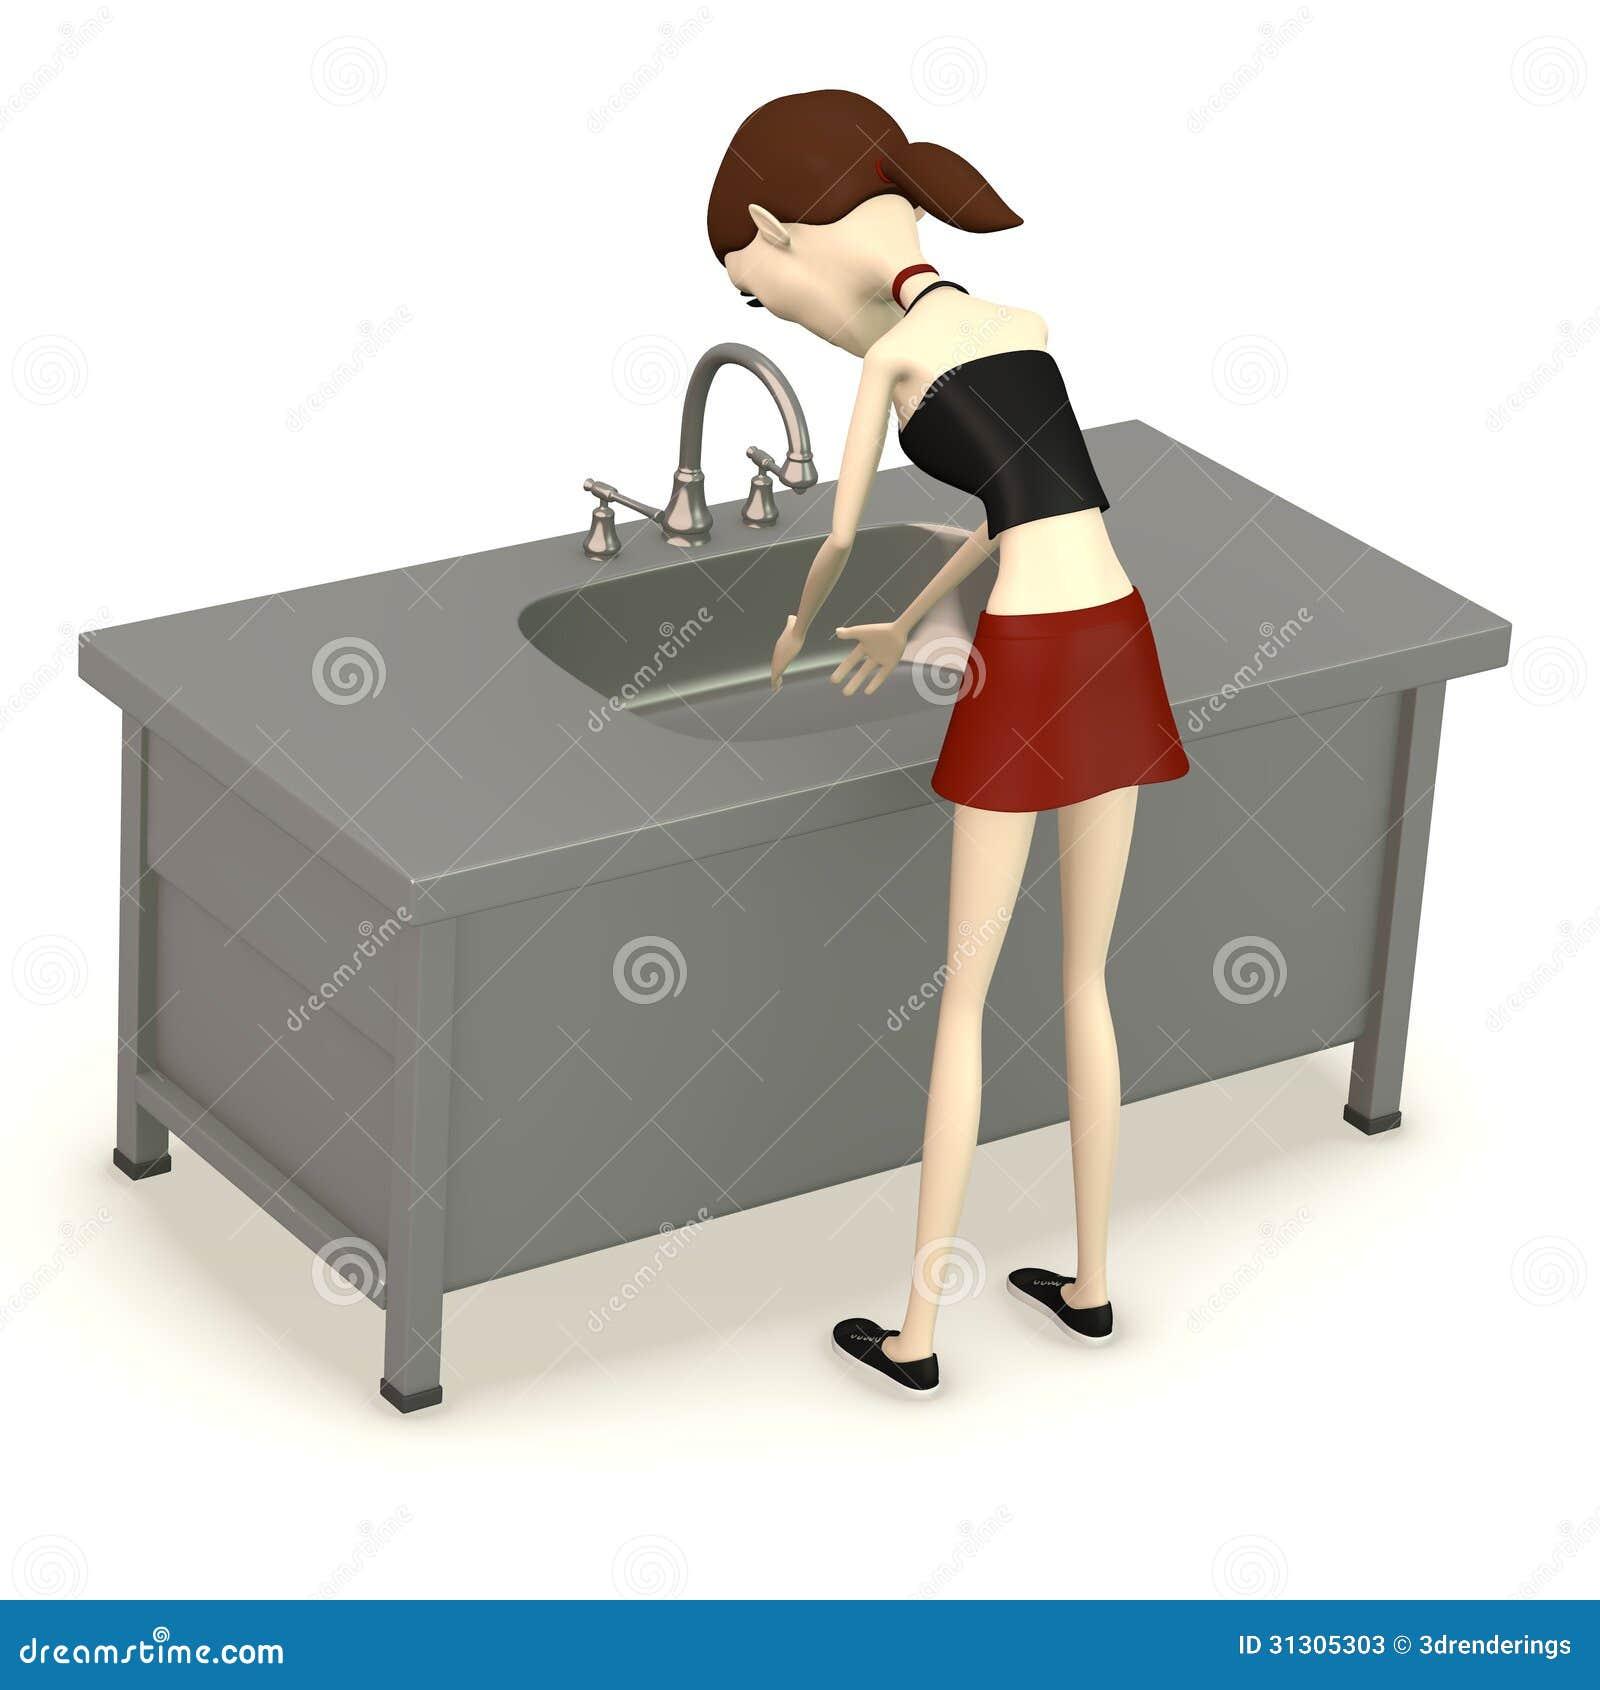 Cartoon Kitchen Sink ~ Cartoon girl with sink stock illustration image of cook